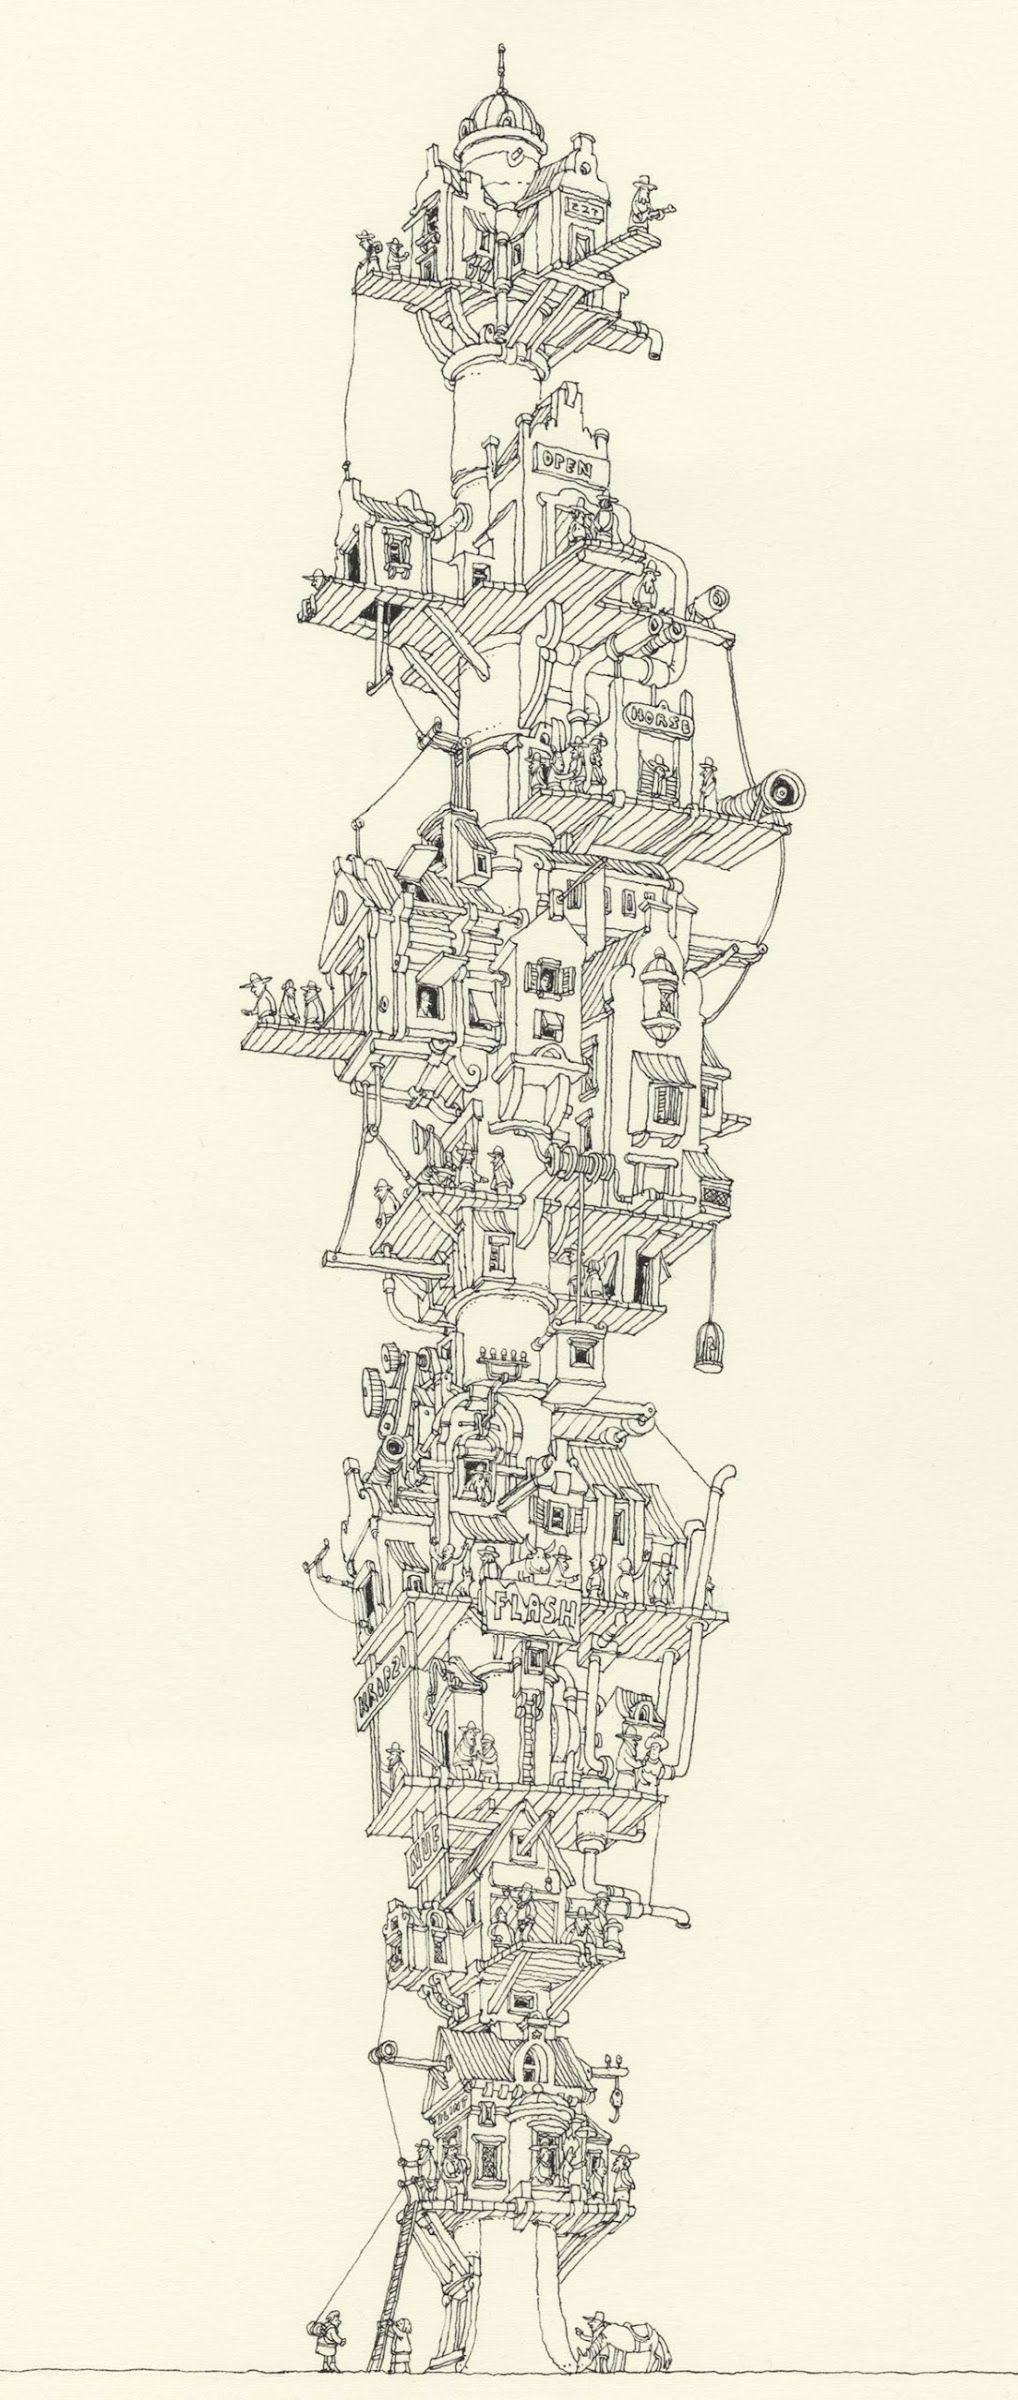 Mattias Inks: Telephone installation